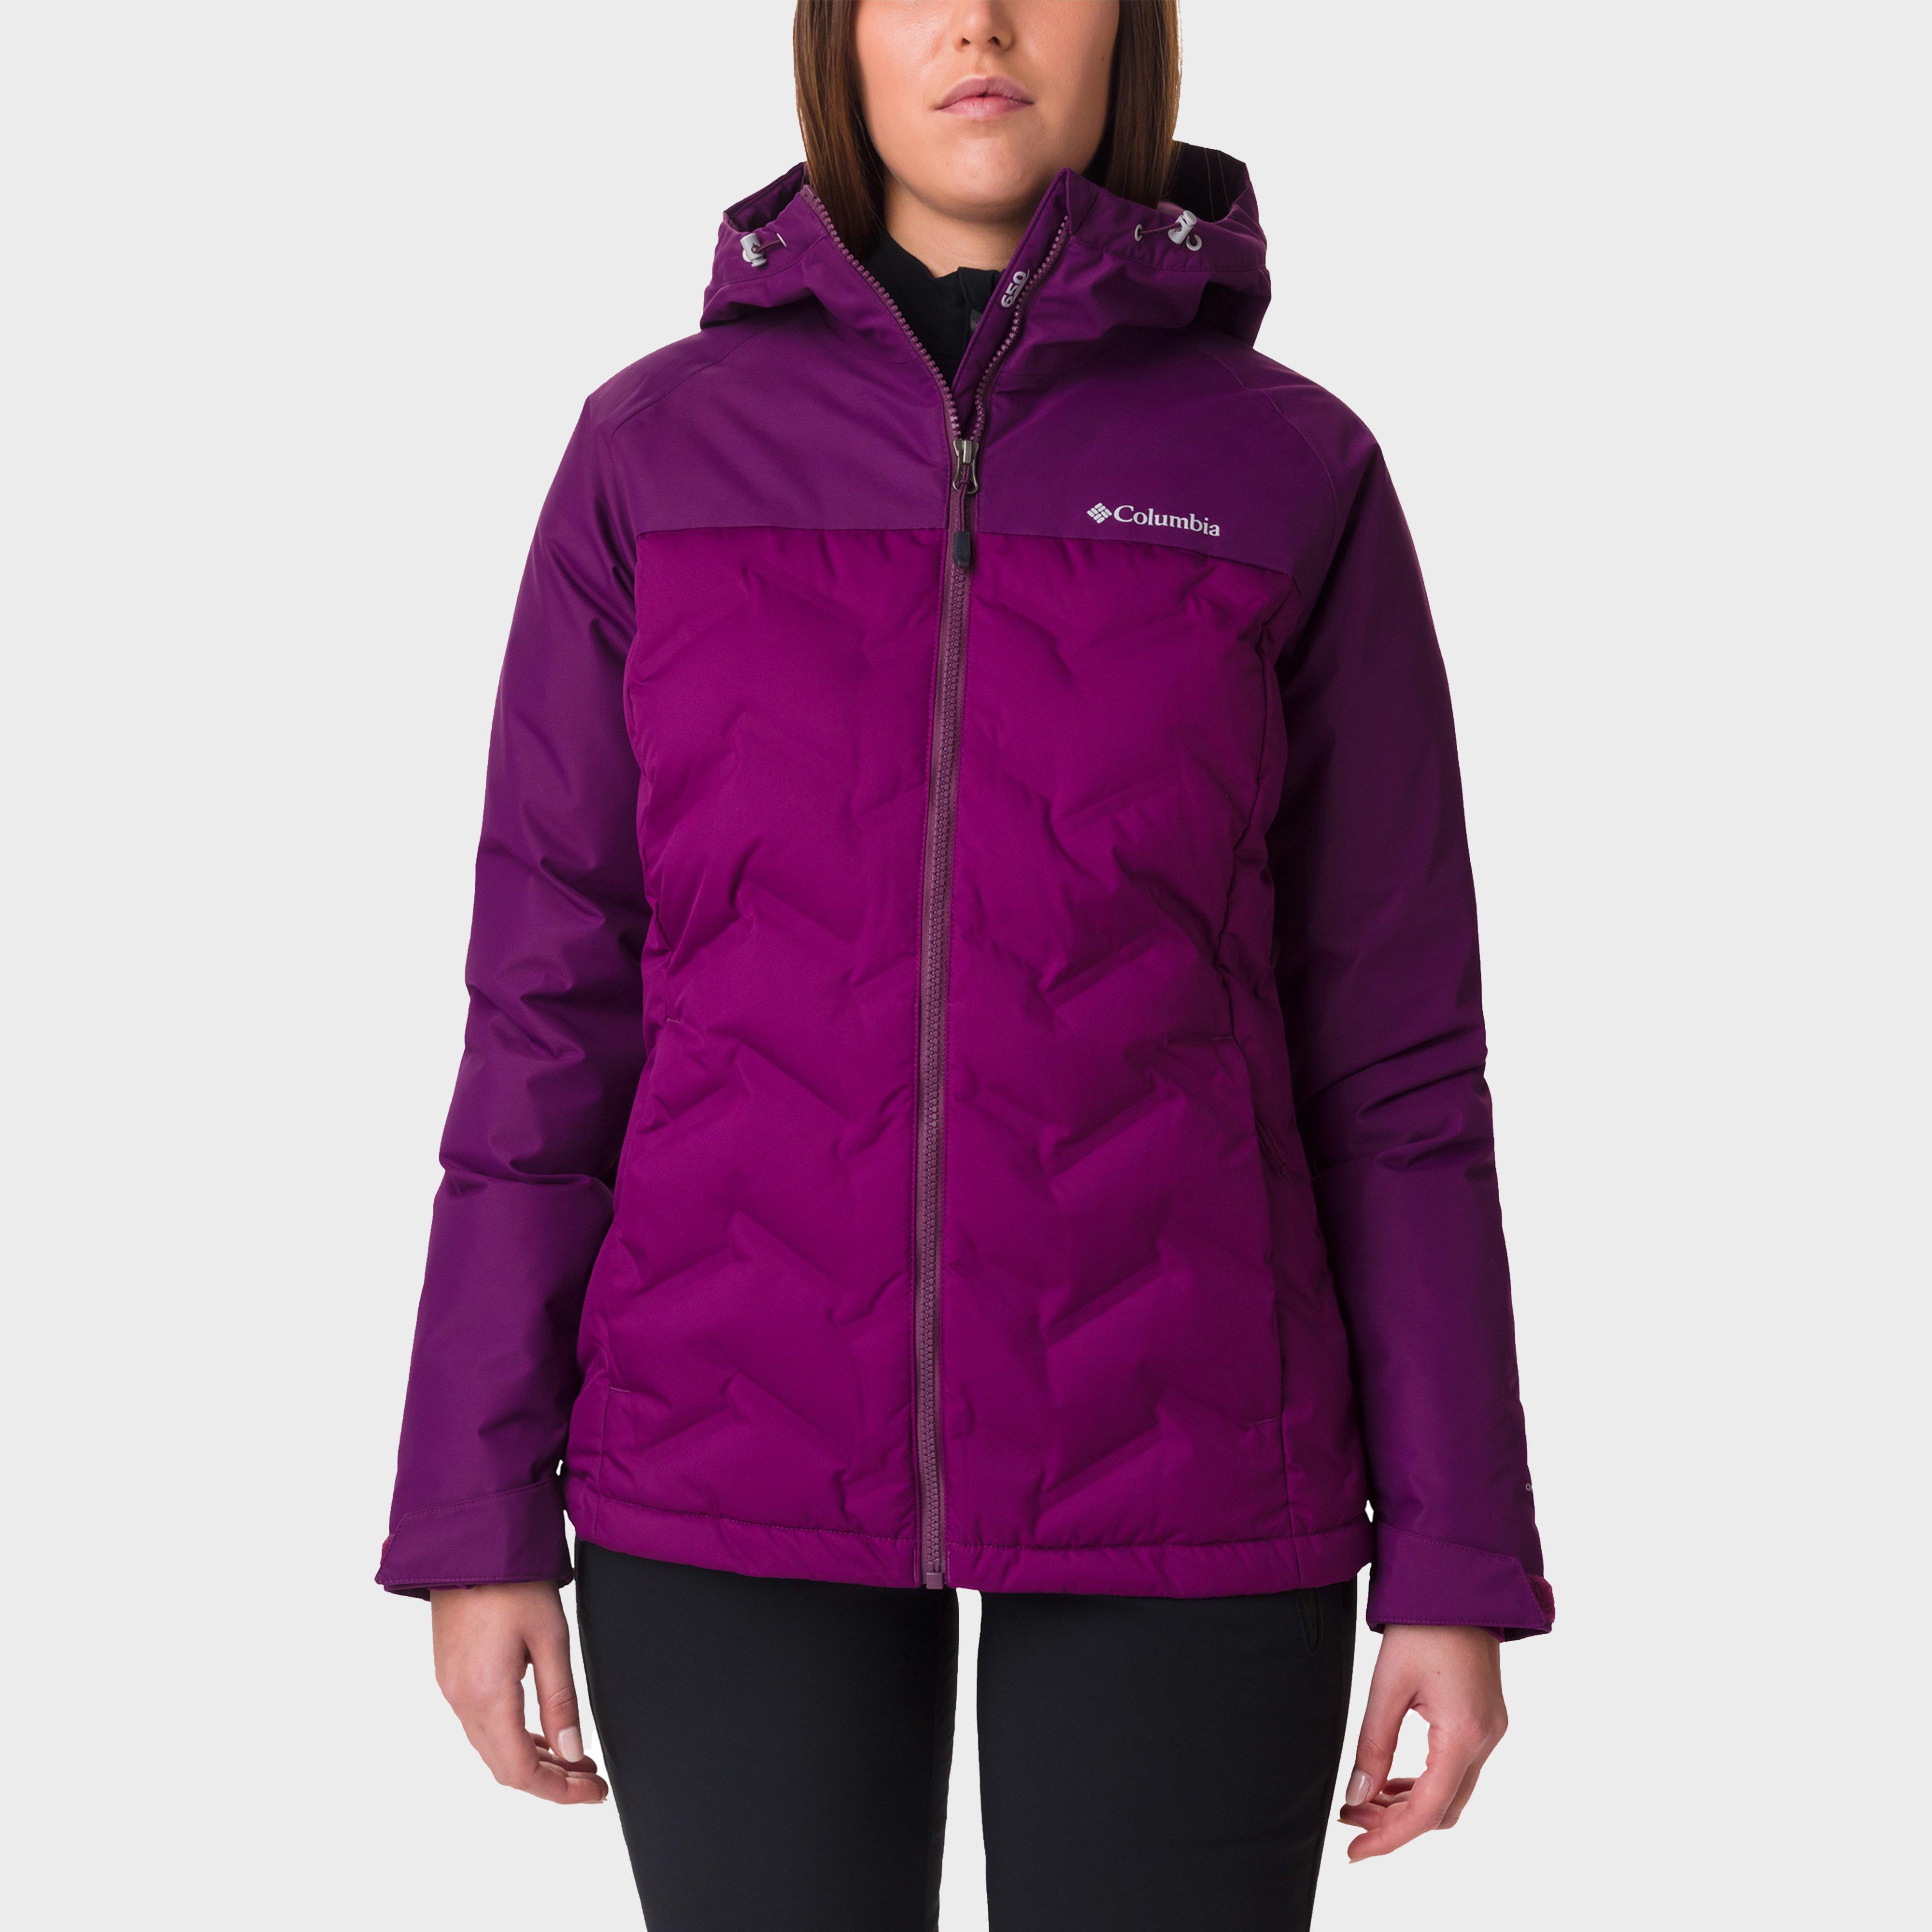 Columbia Women's Grand Trek Down Jacket, Purple